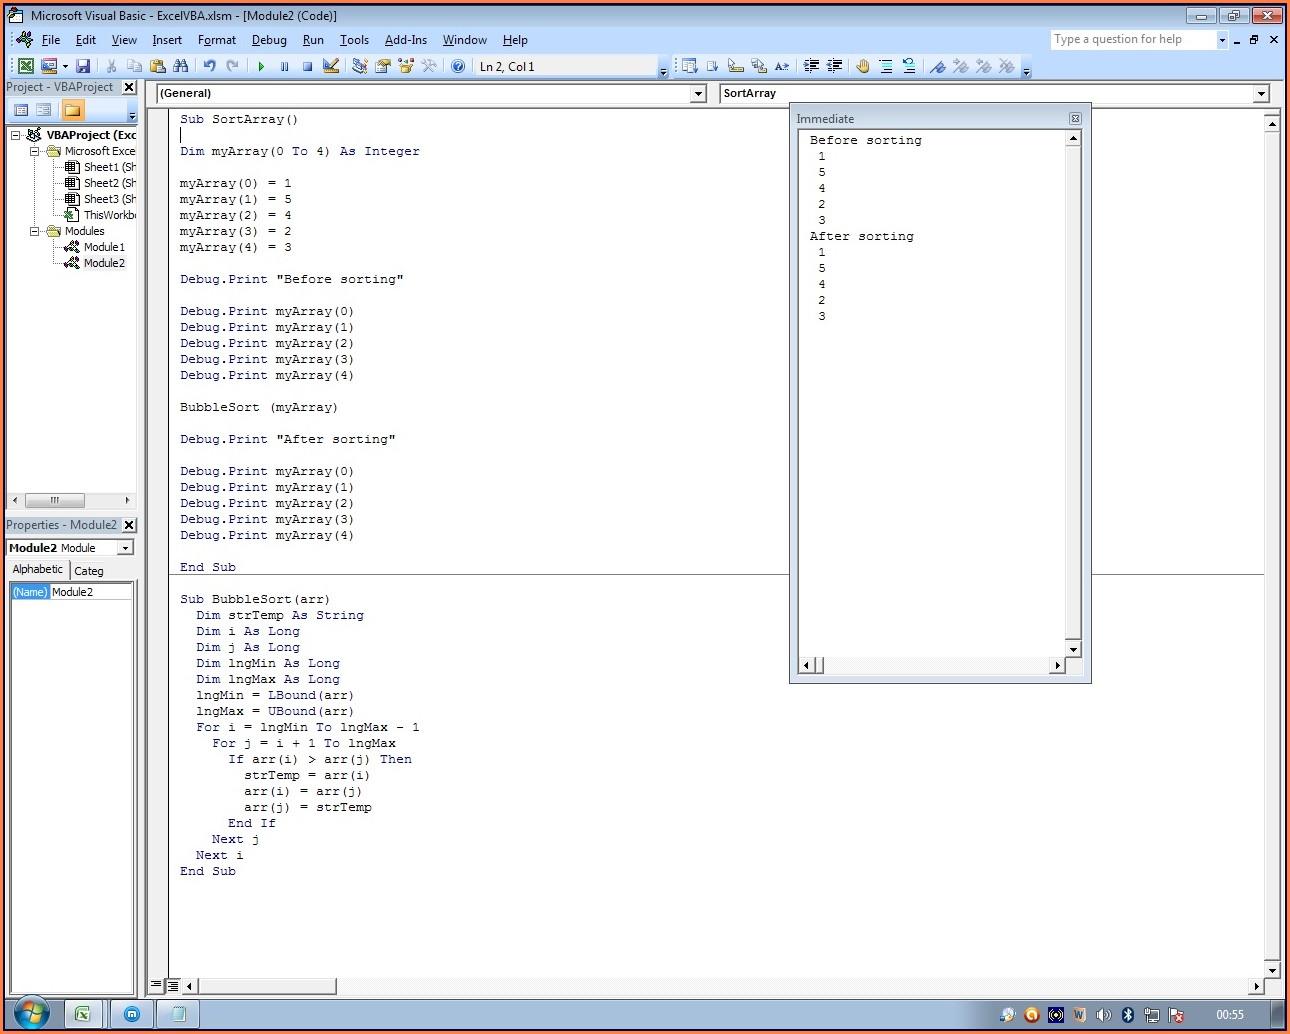 Excel Vba Sort Array Function